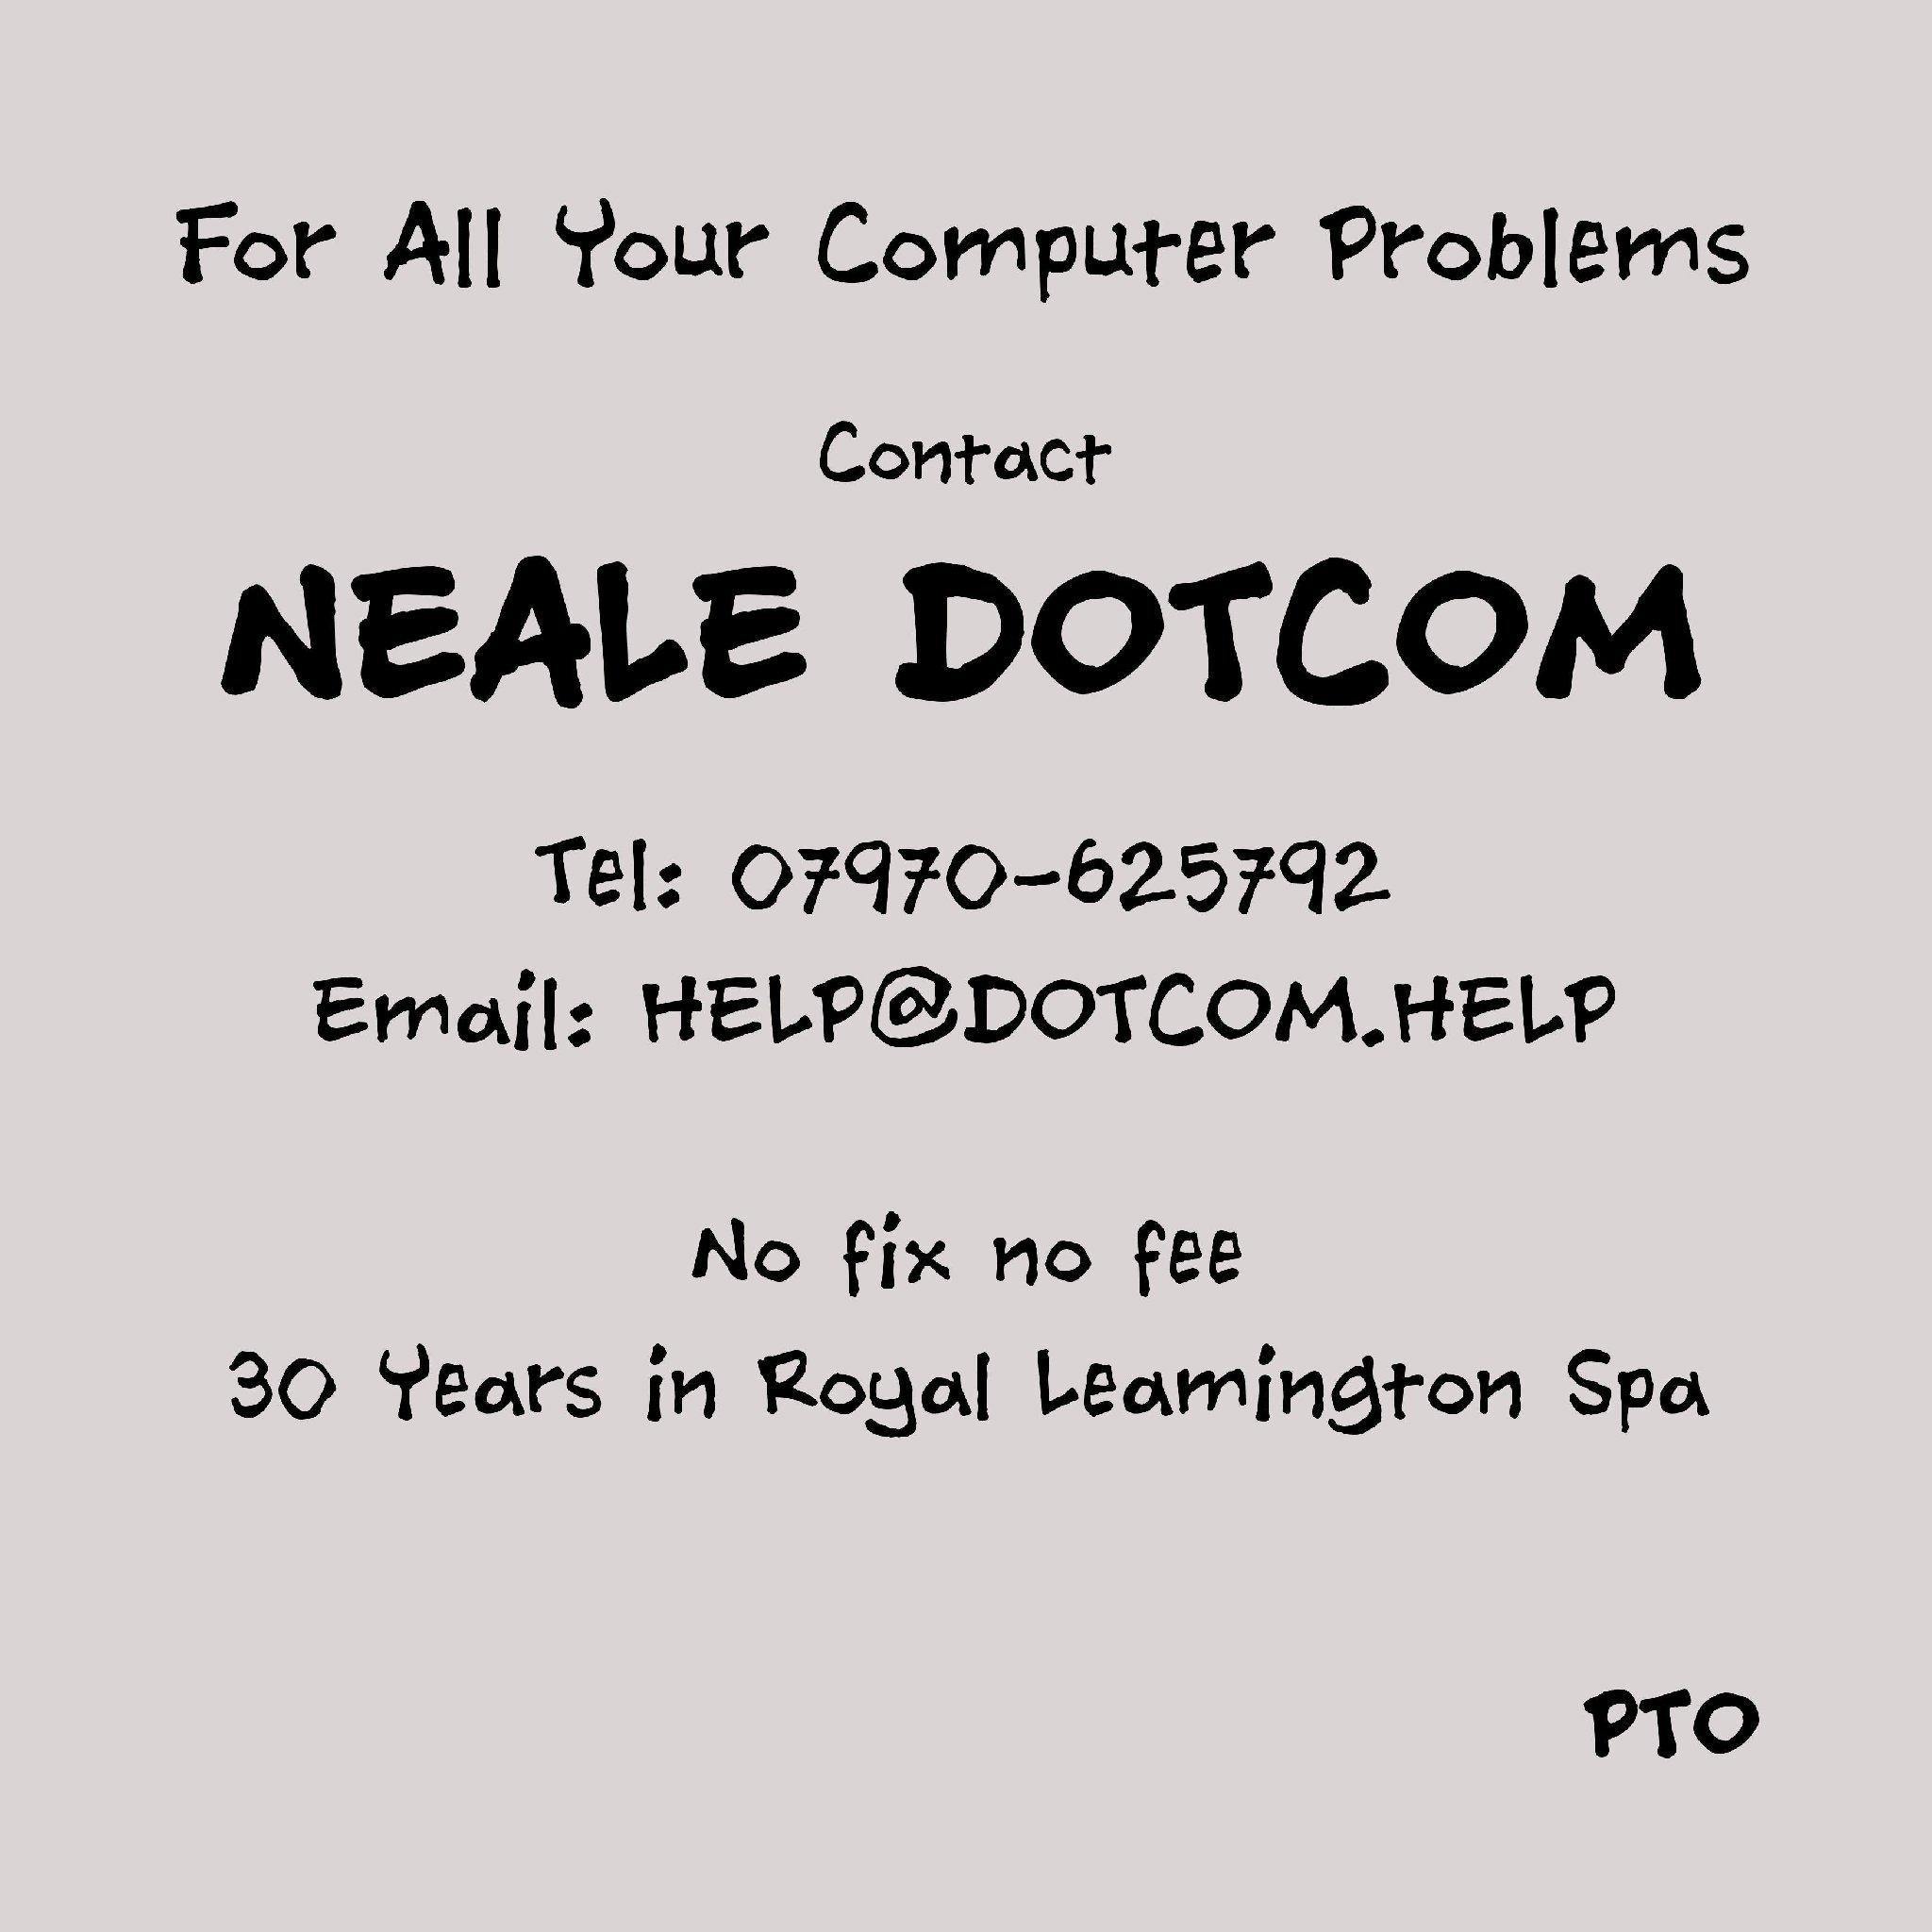 Dotcom.Help